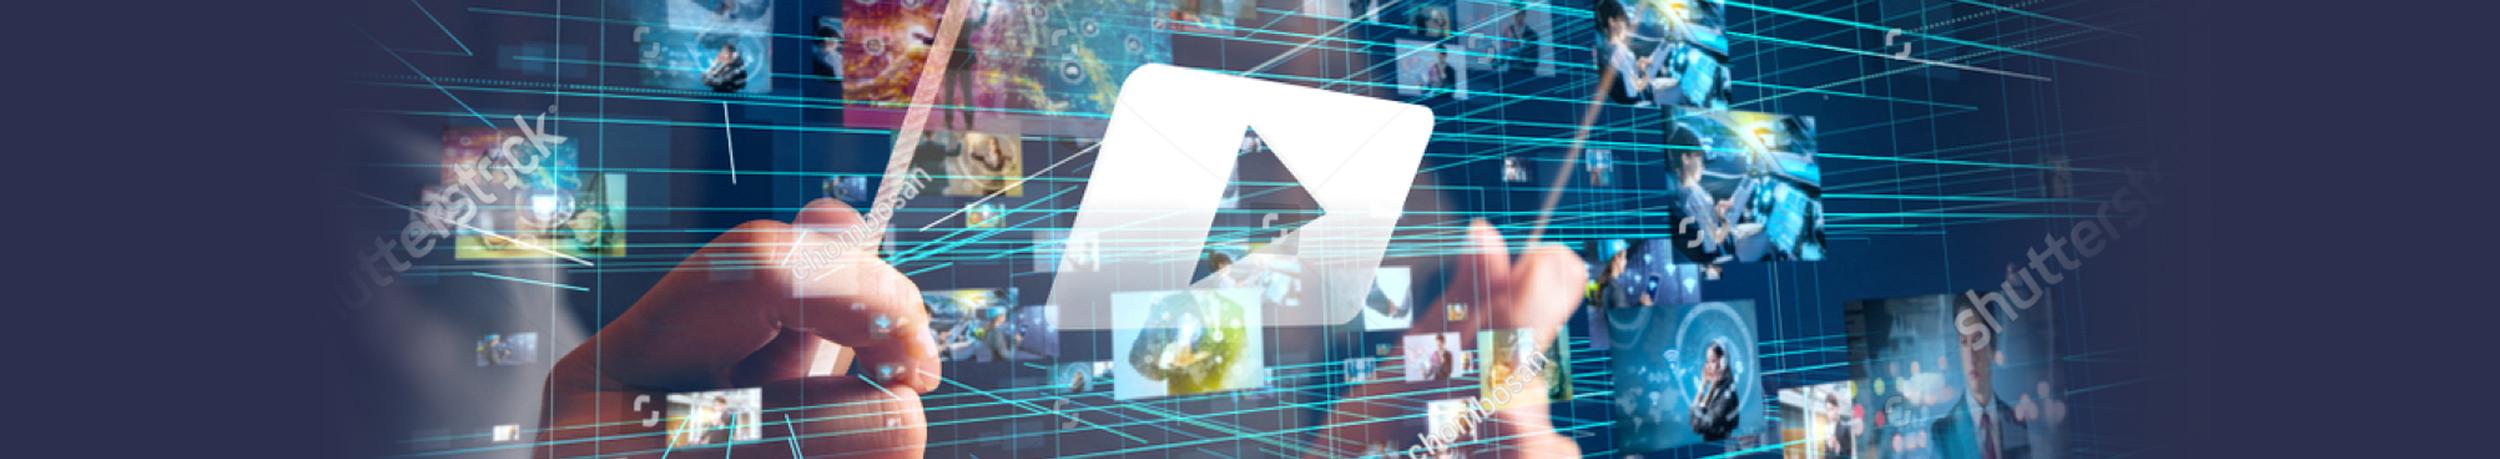 display-marketing-video-marketing